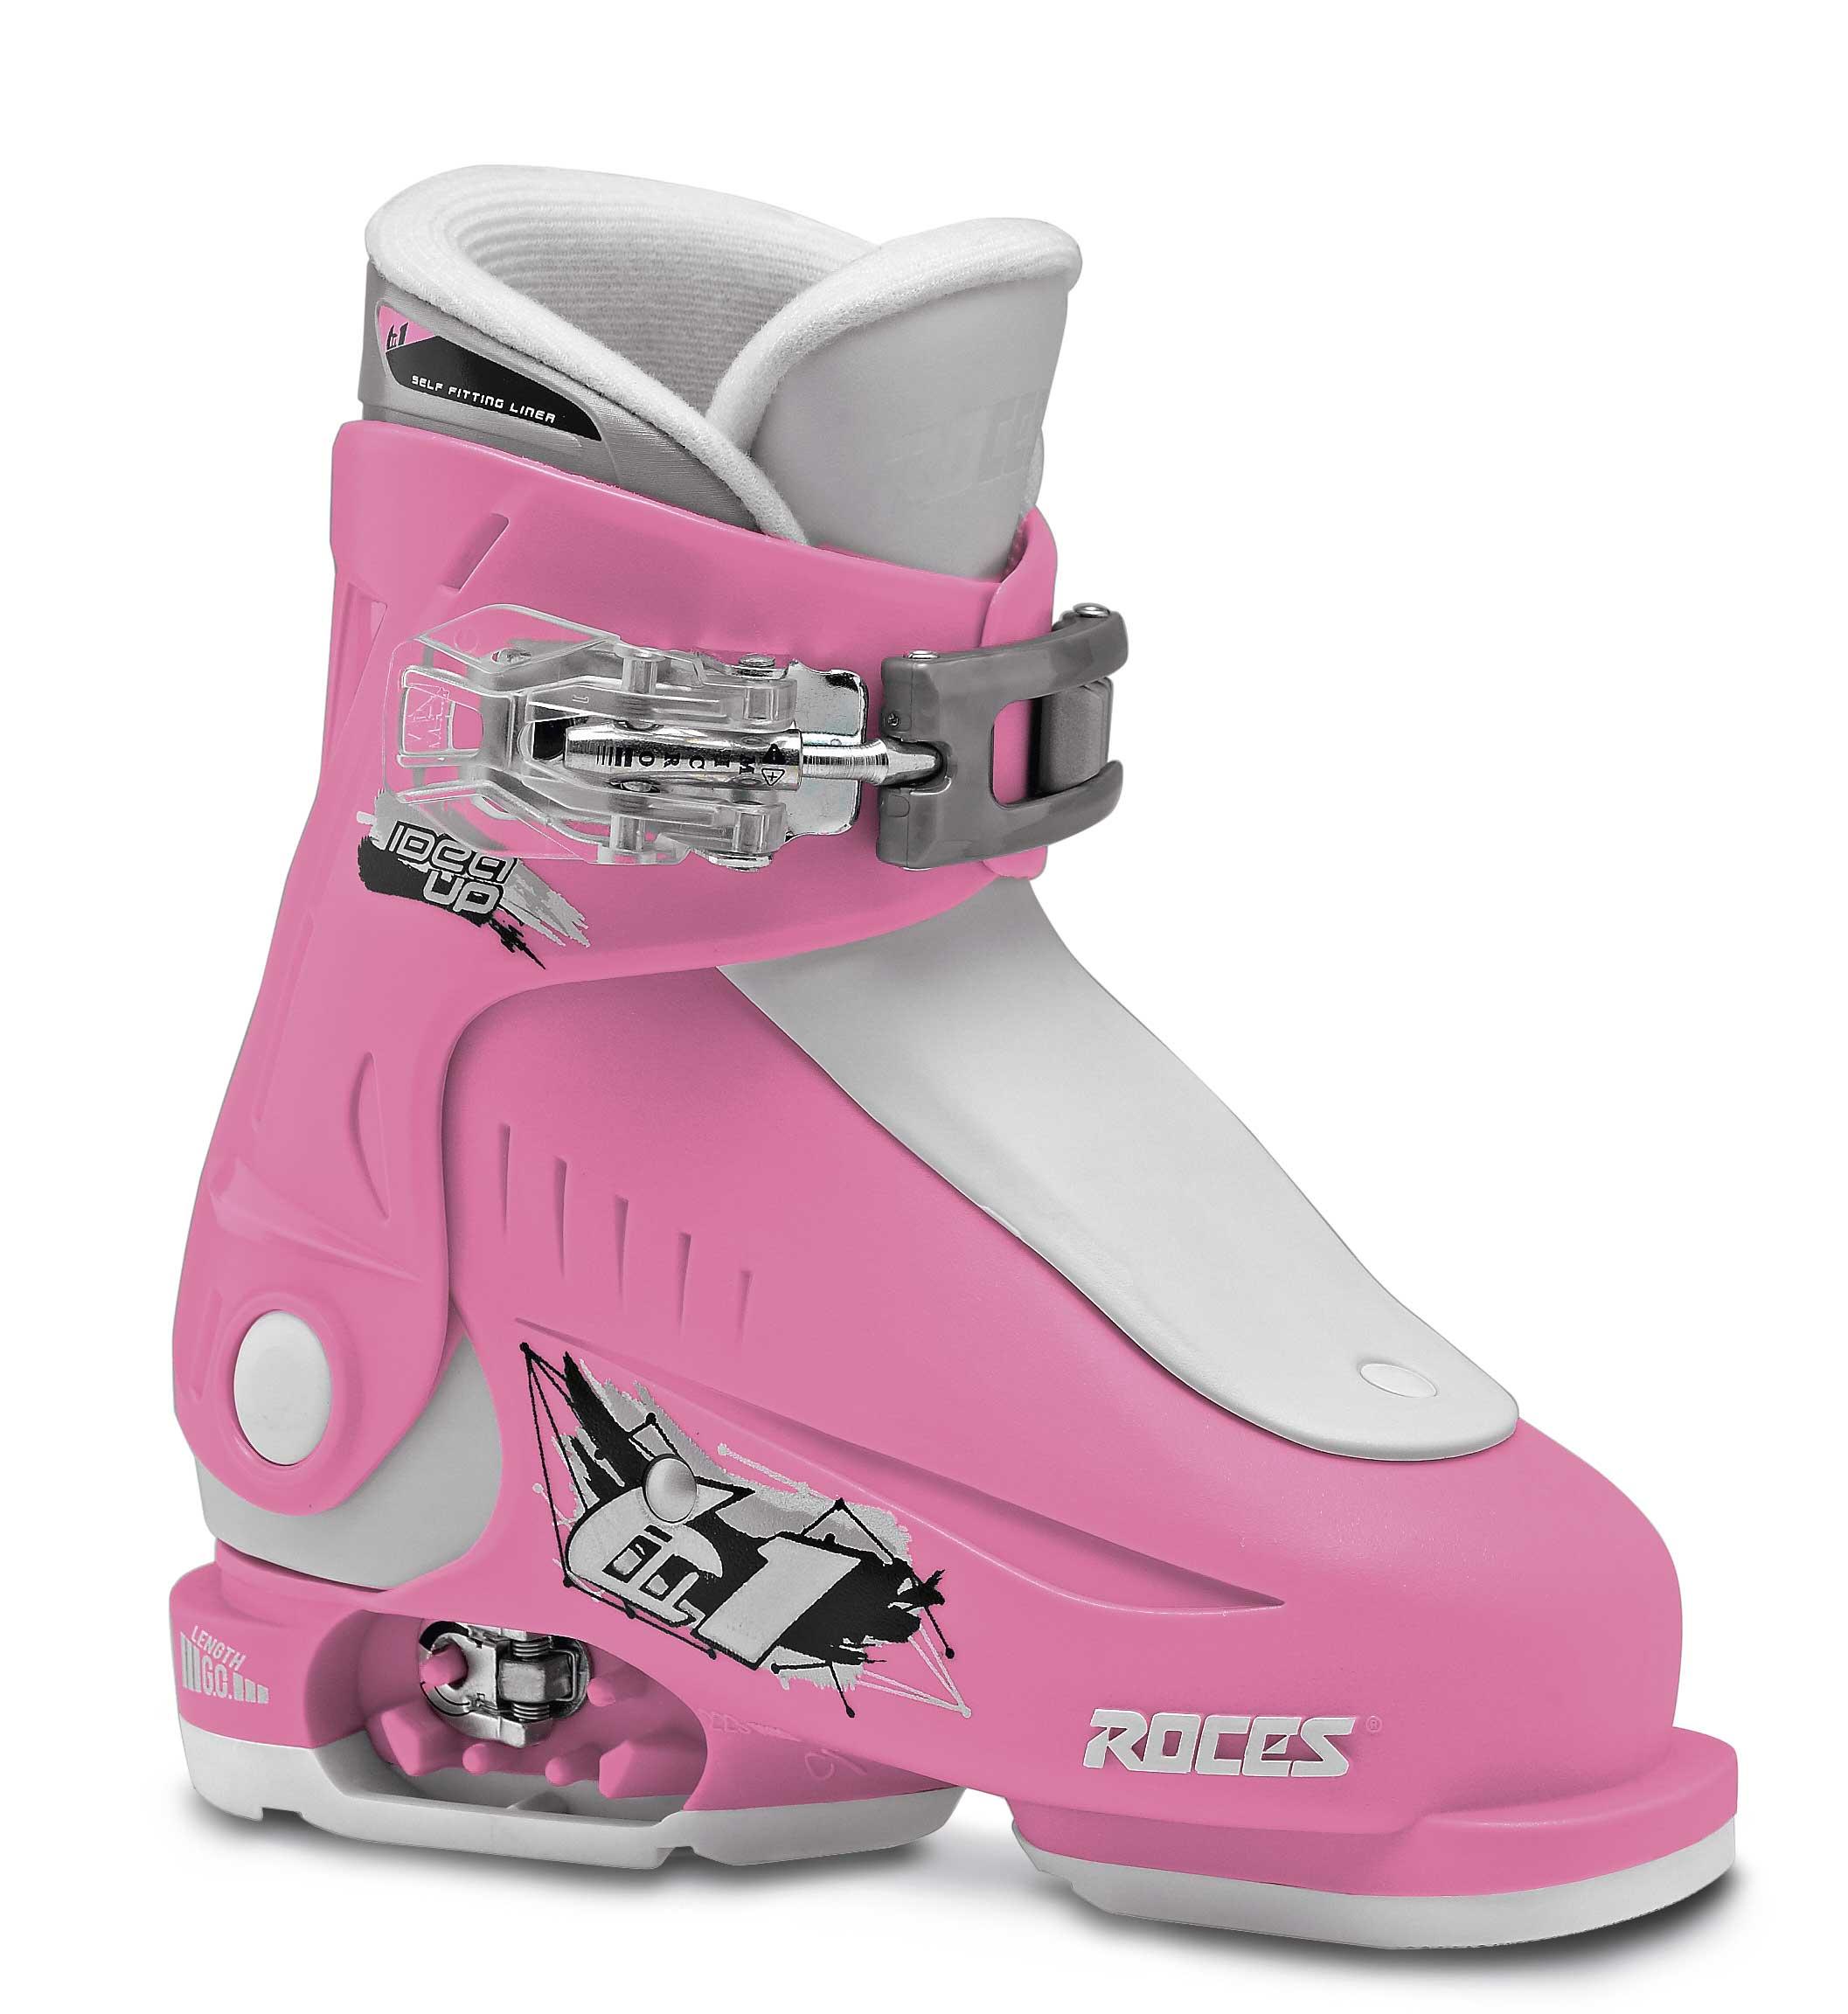 Roces Idea Up Deep Pink White 25-29